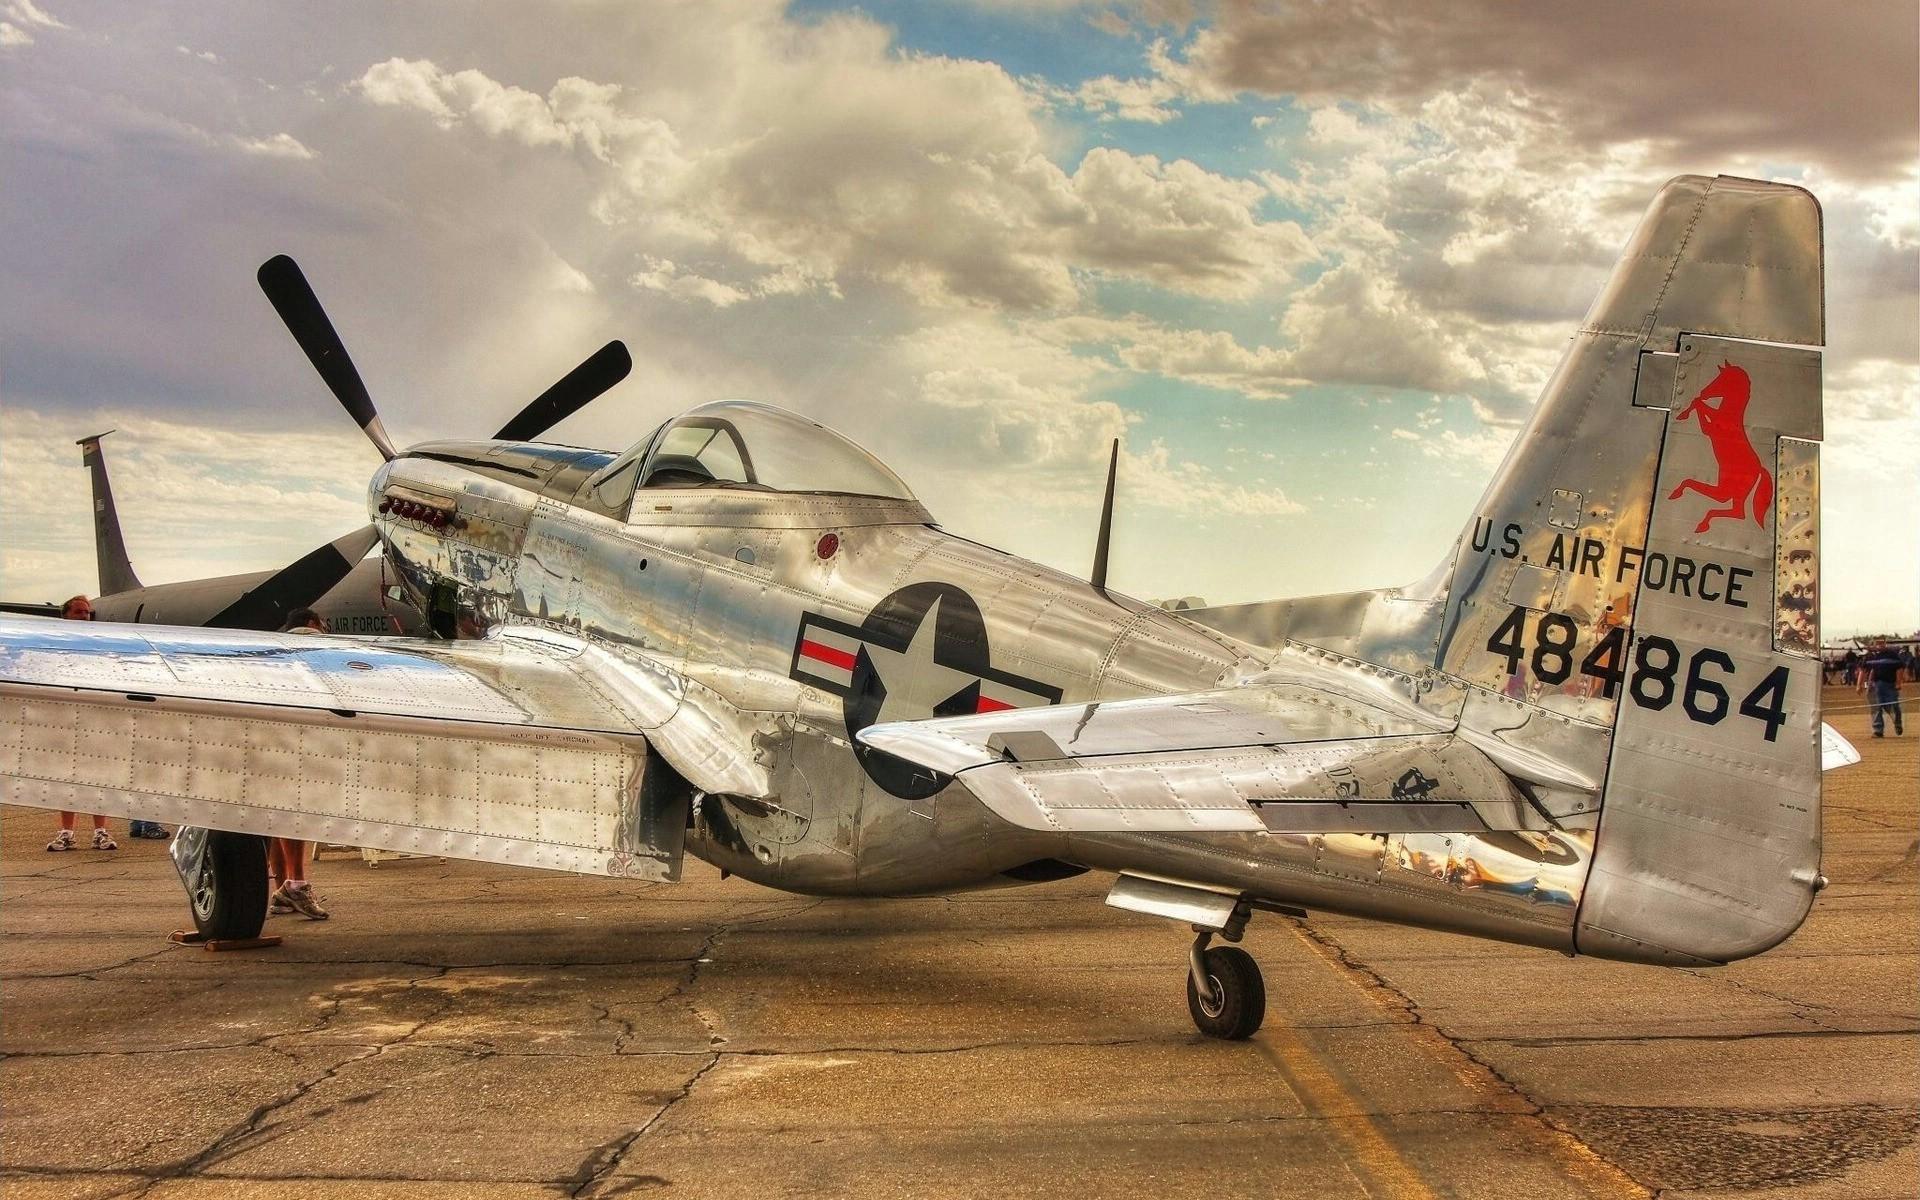 Vintage Airplane Wallpapers 1920x1200